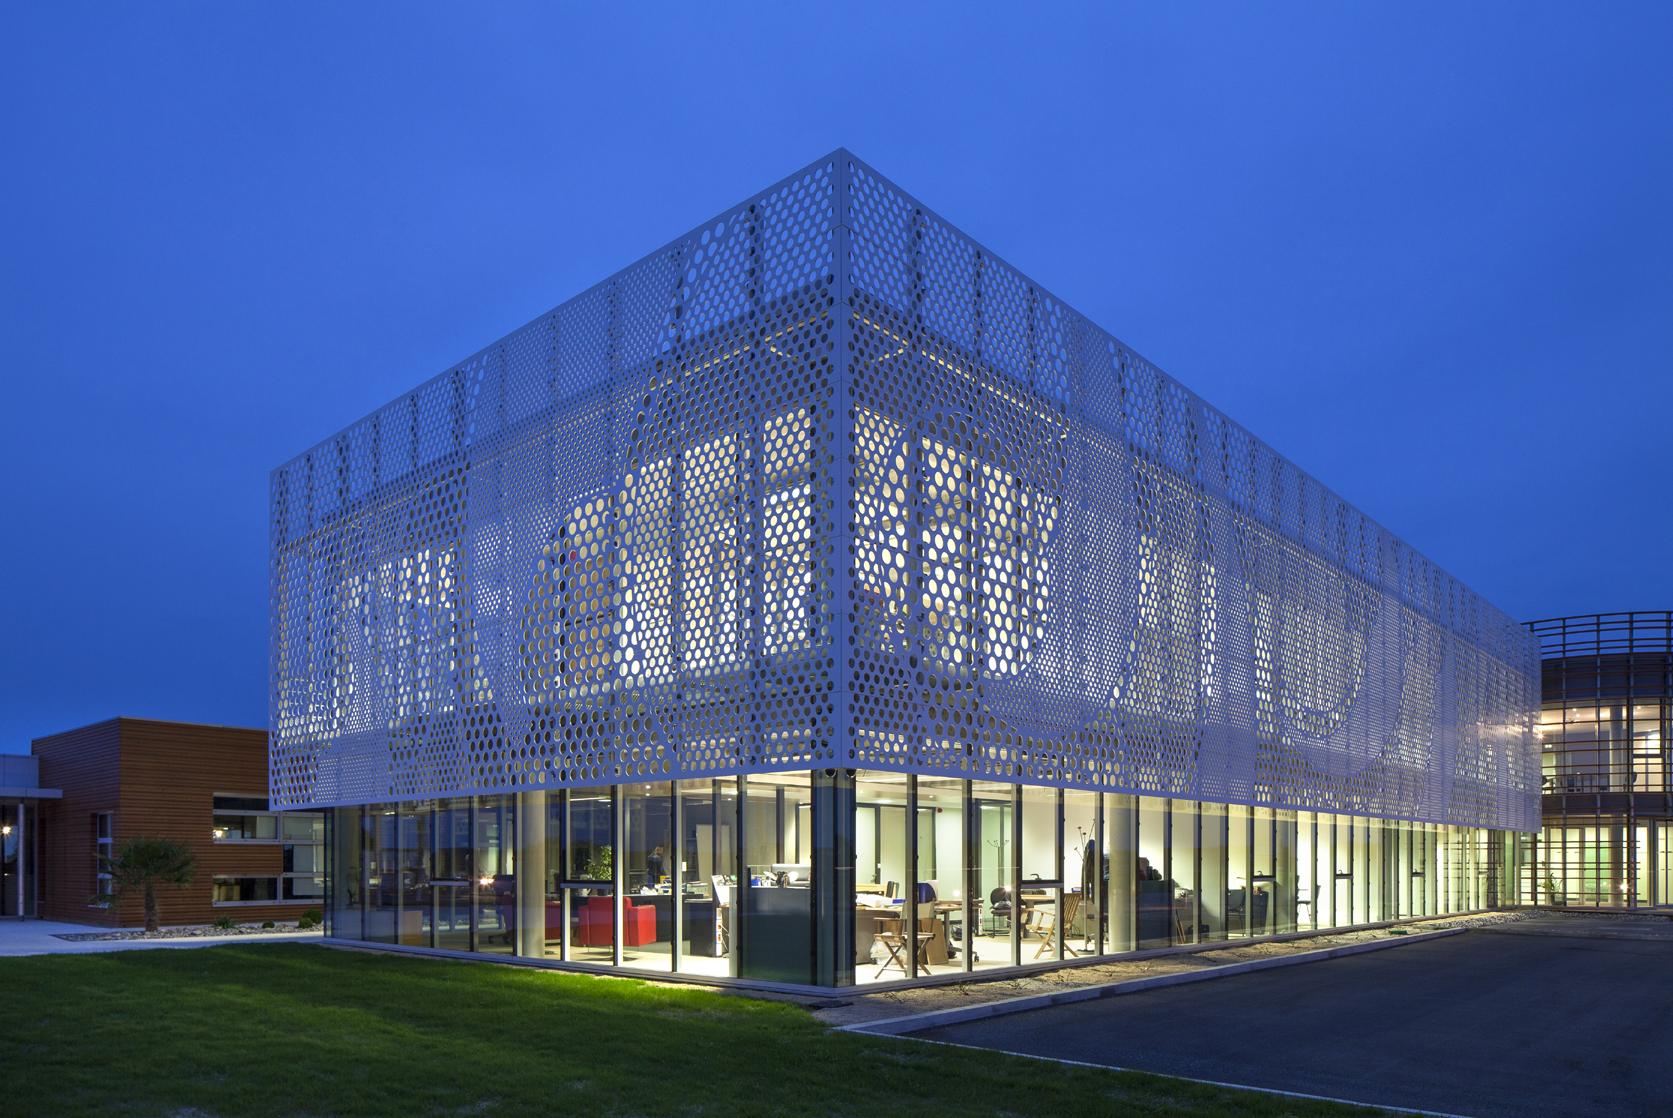 Beneteau S Headquarters Fa 231 Ade Completed With Hi Macs